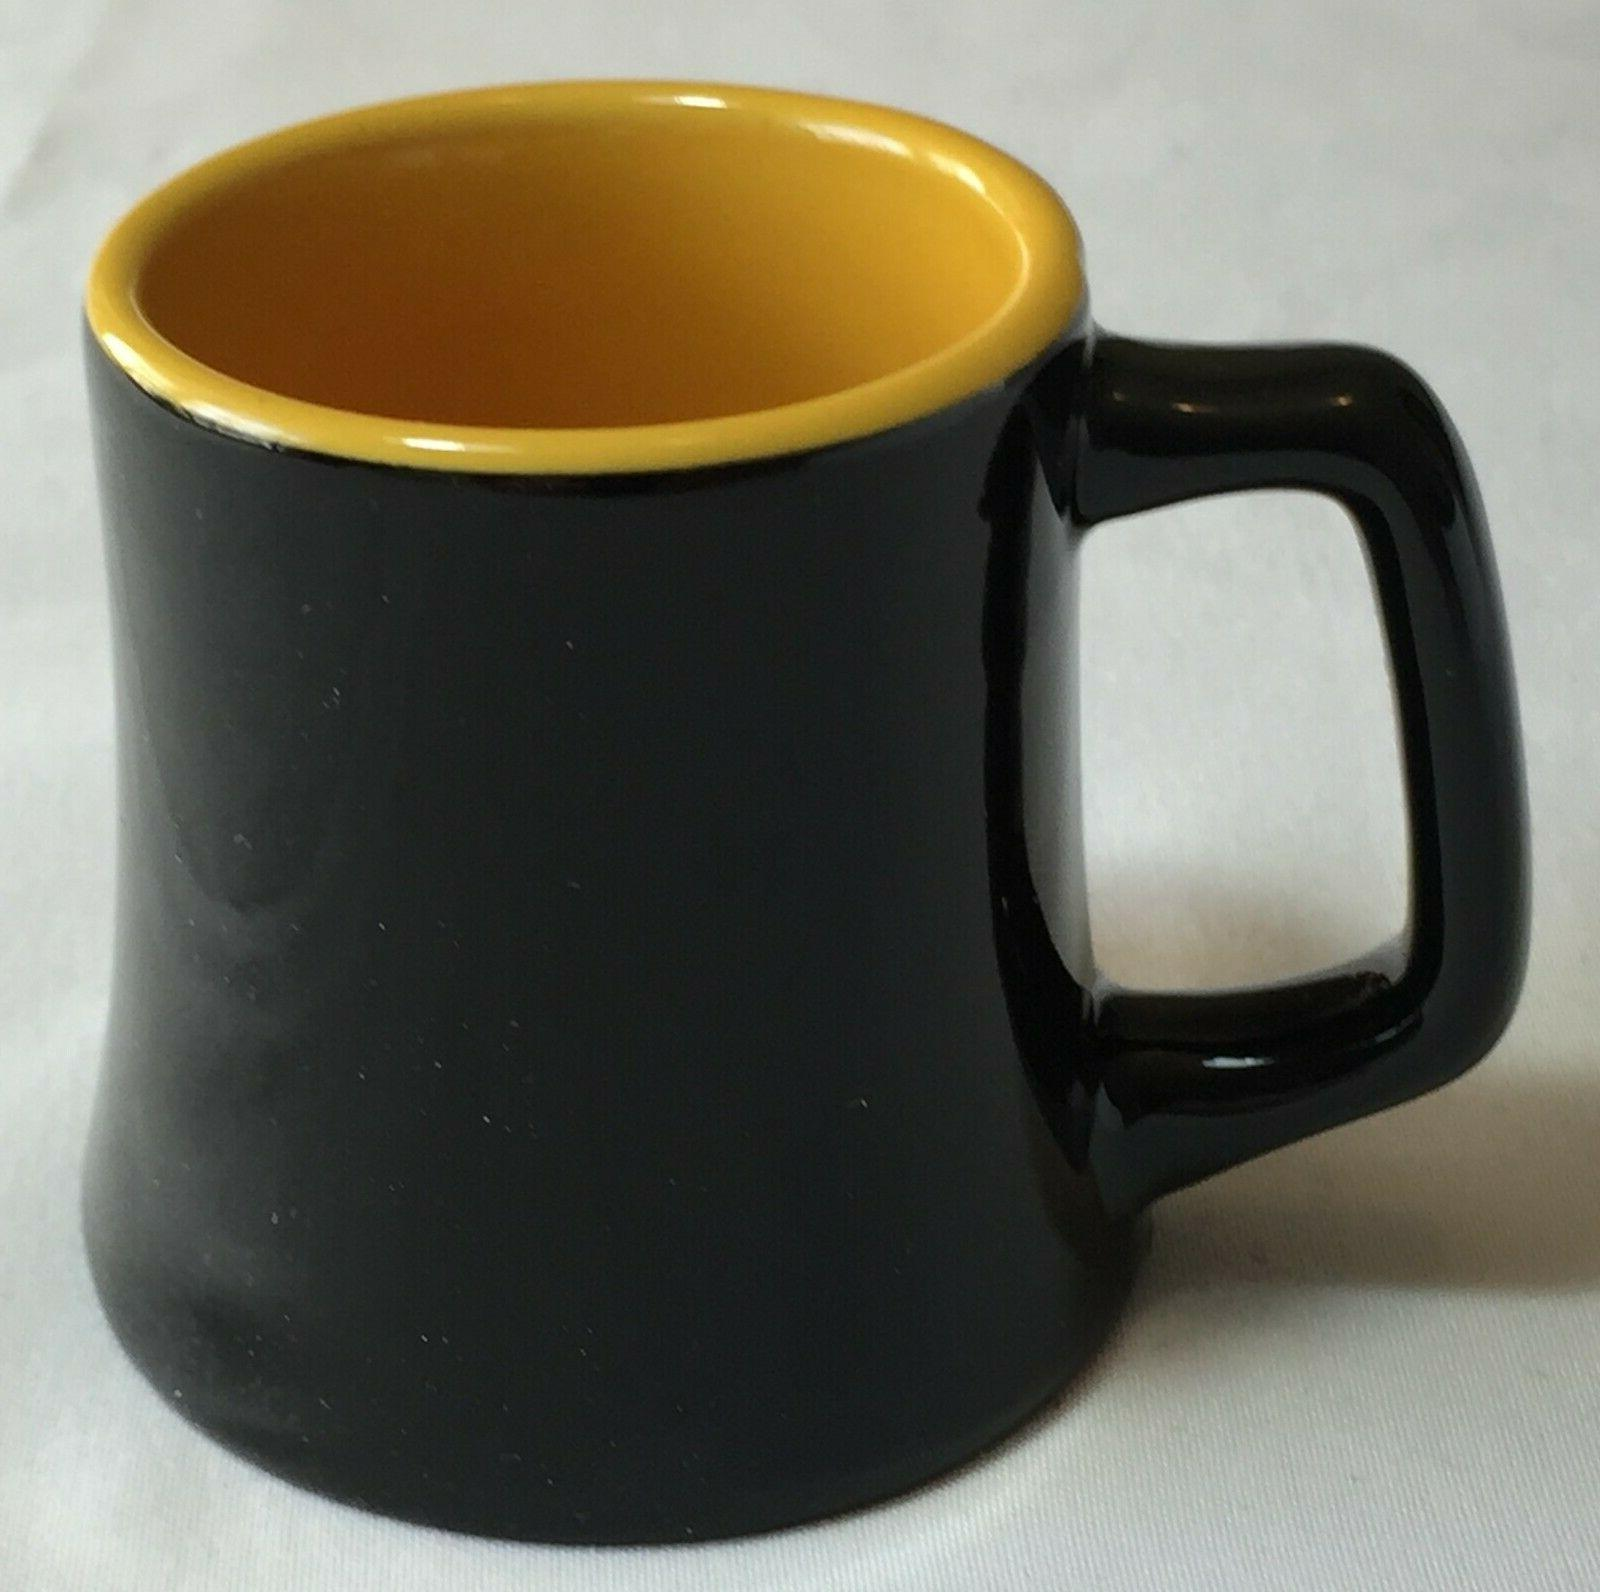 New 2 oz Cup,